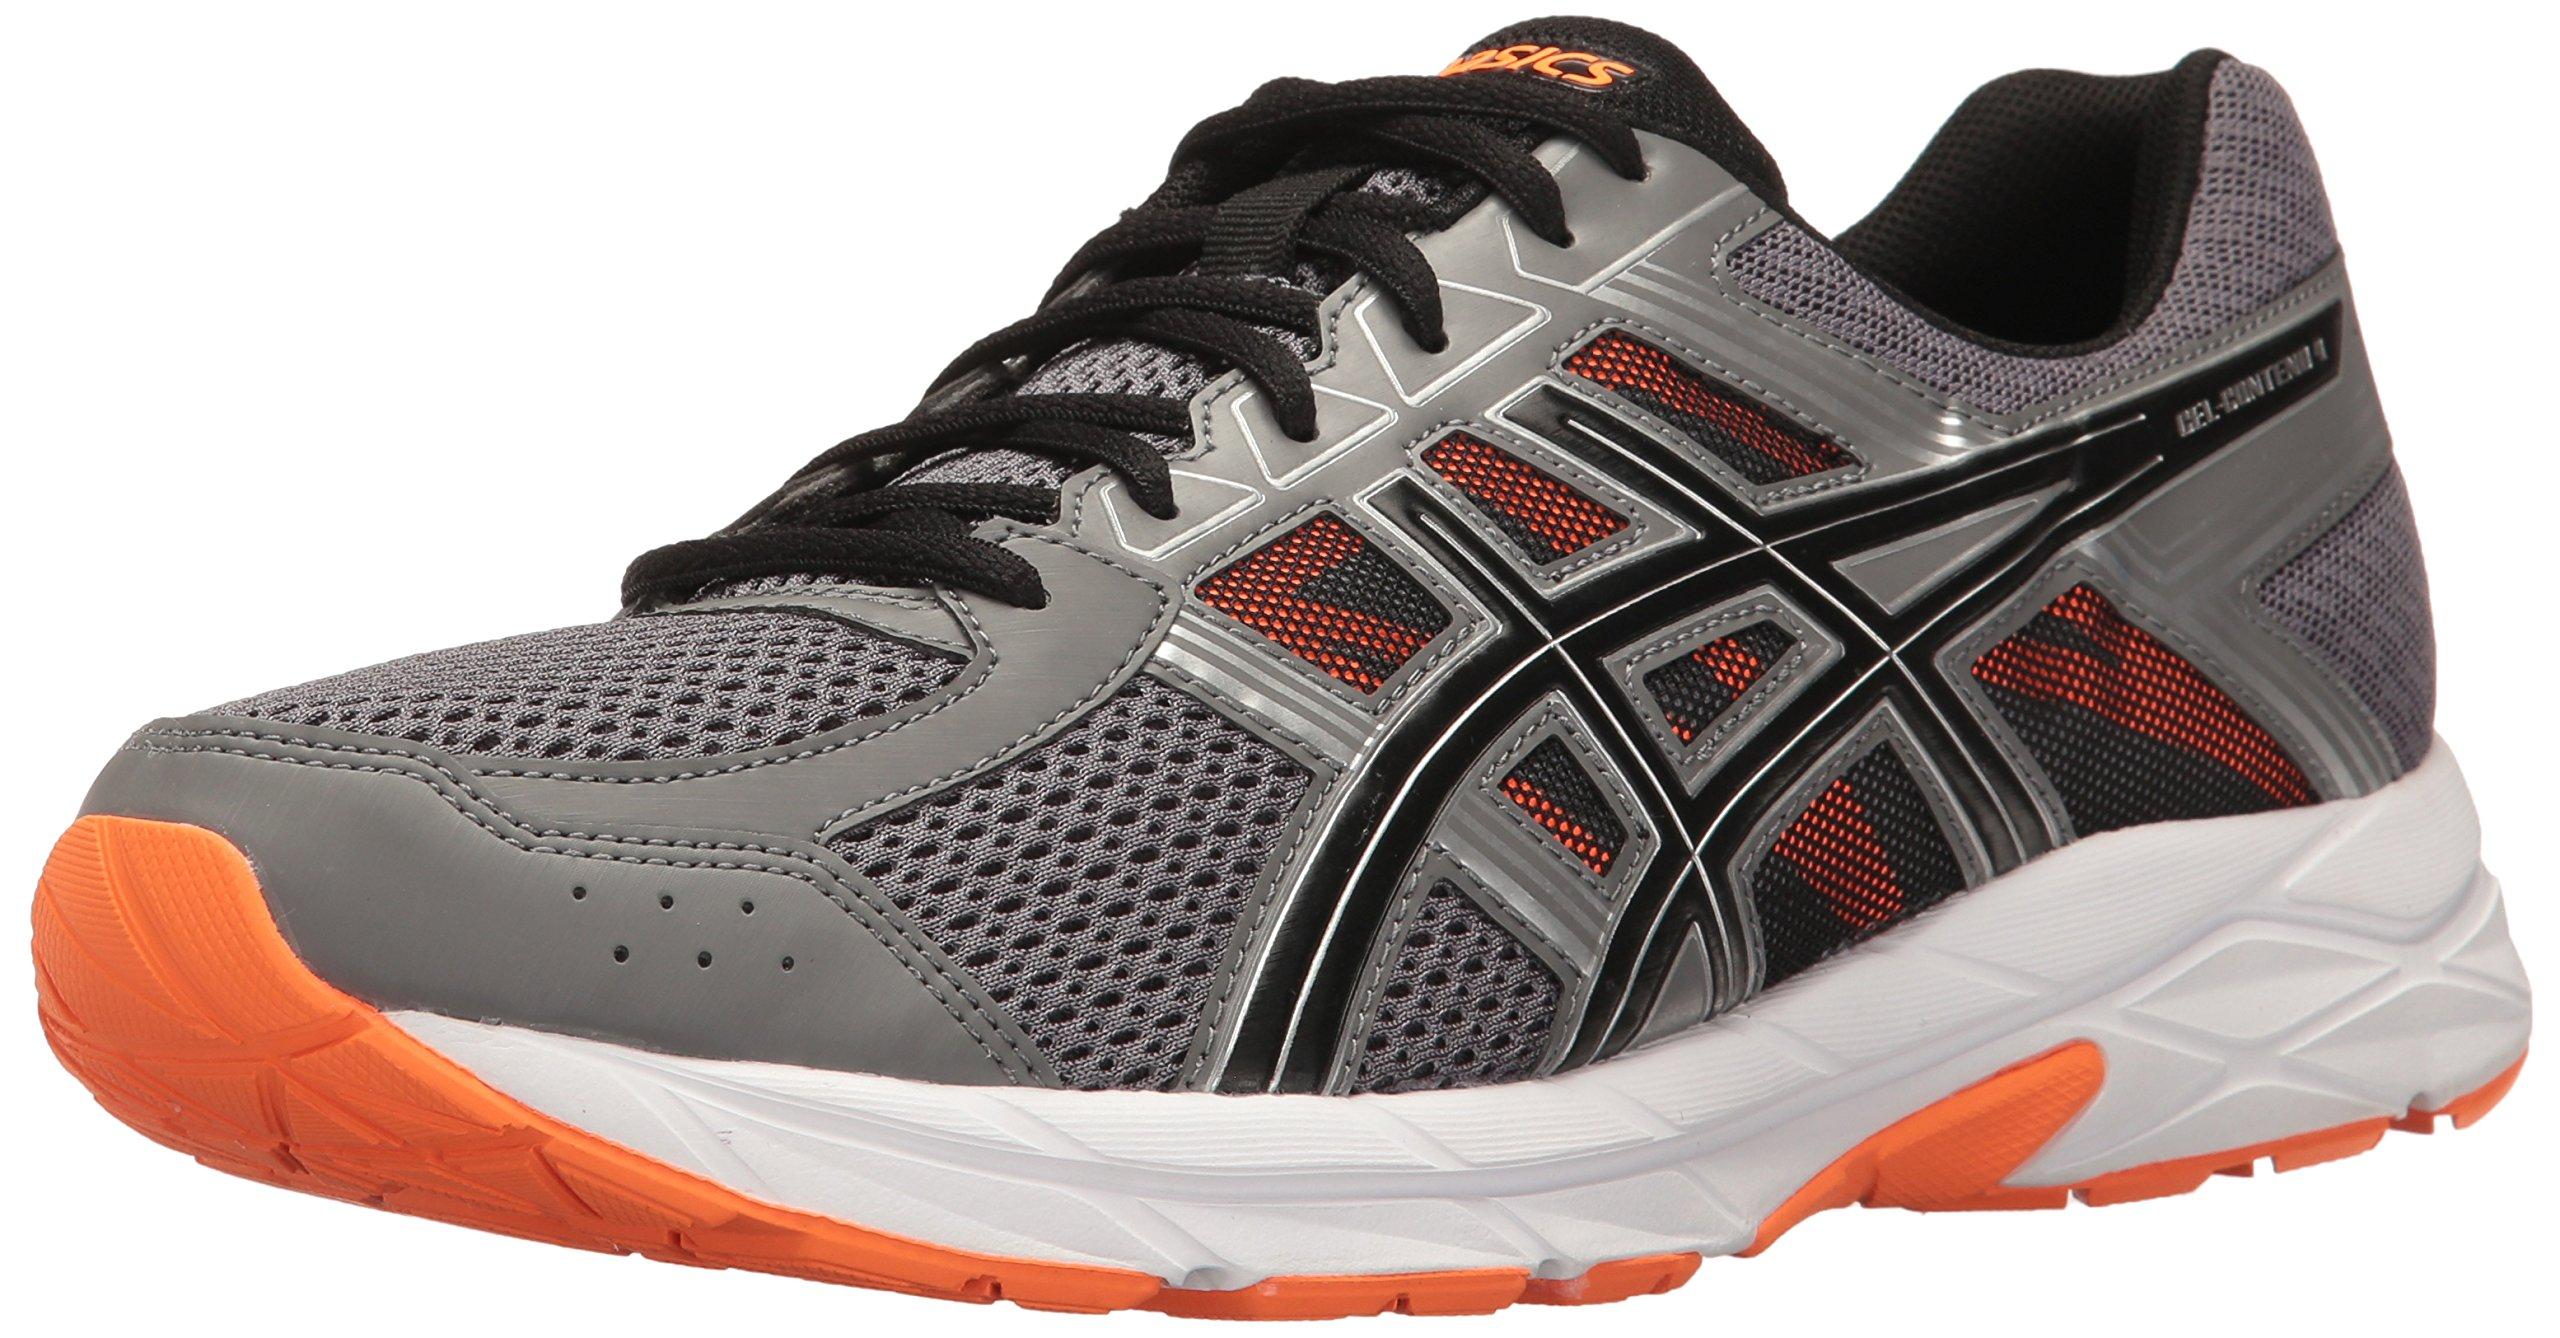 ASICS Men's Gel-Contend 4 Running Shoe, Carbon/Black/Hot Orange, 6.5 M US